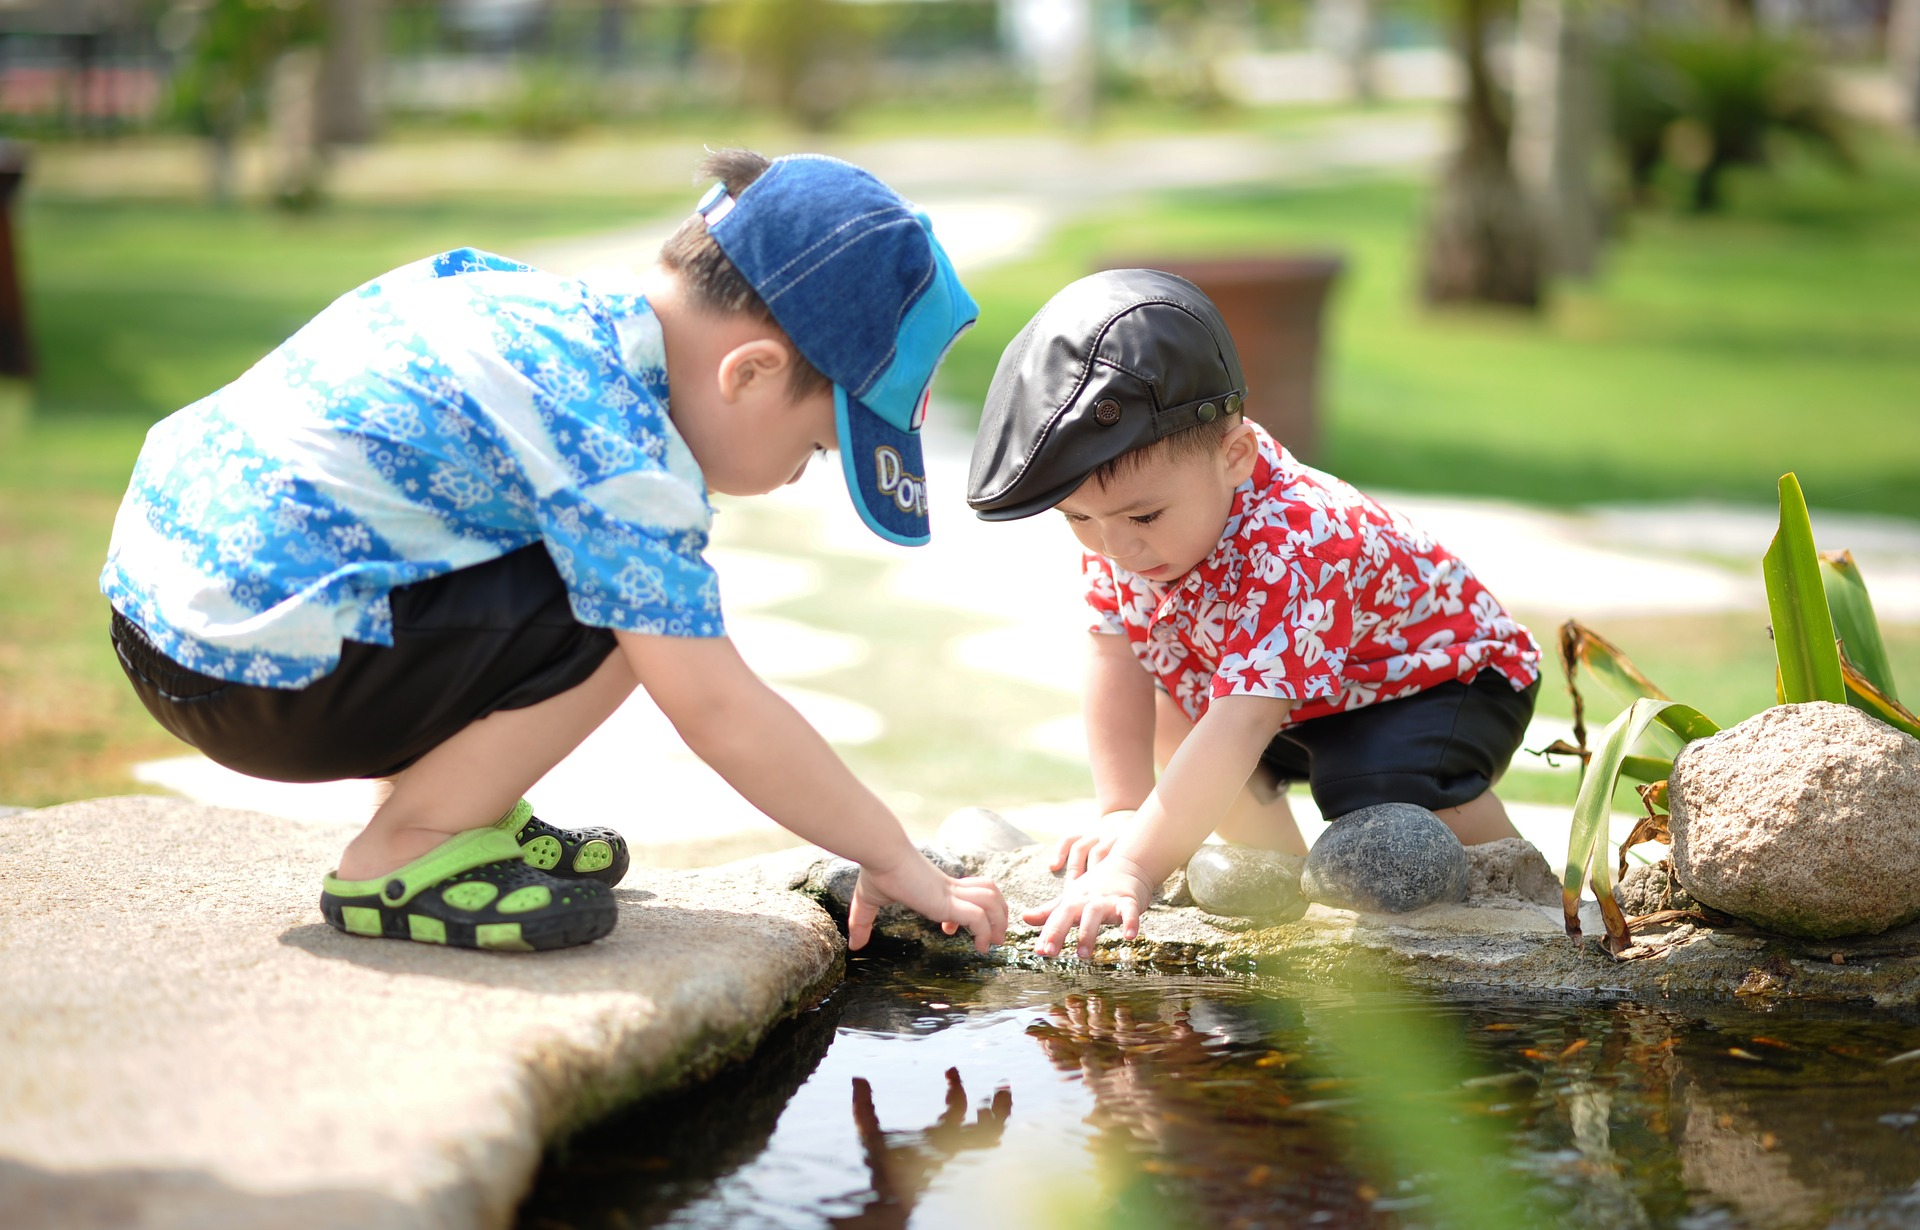 kids playingq